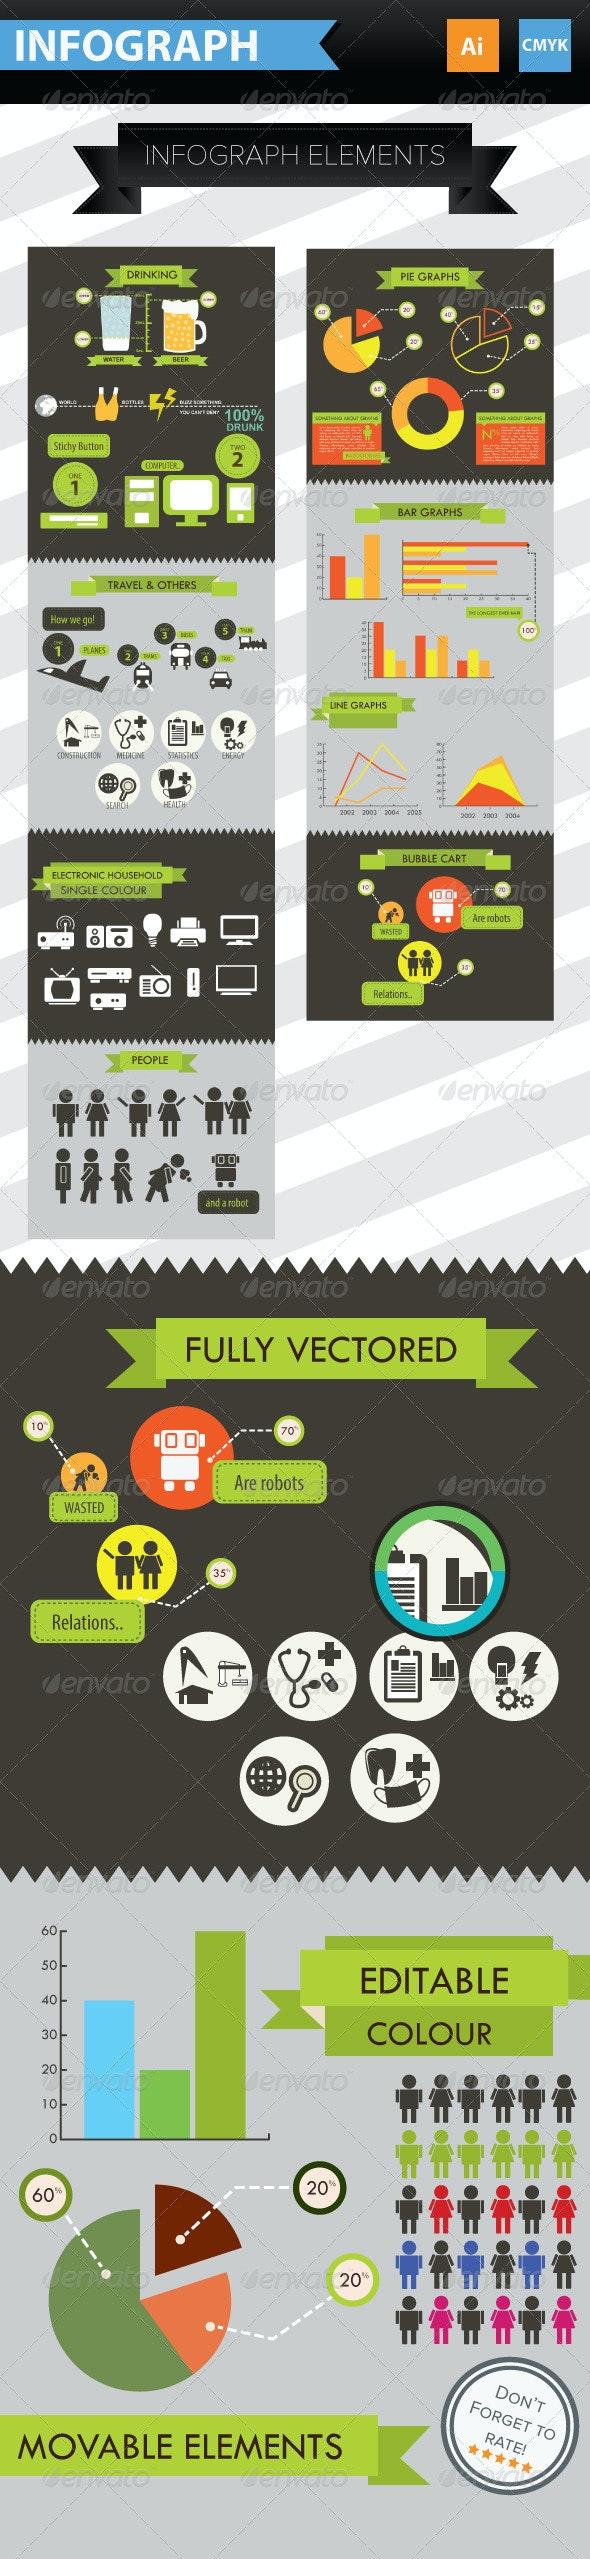 Infographic Elements + Icons - Infographics